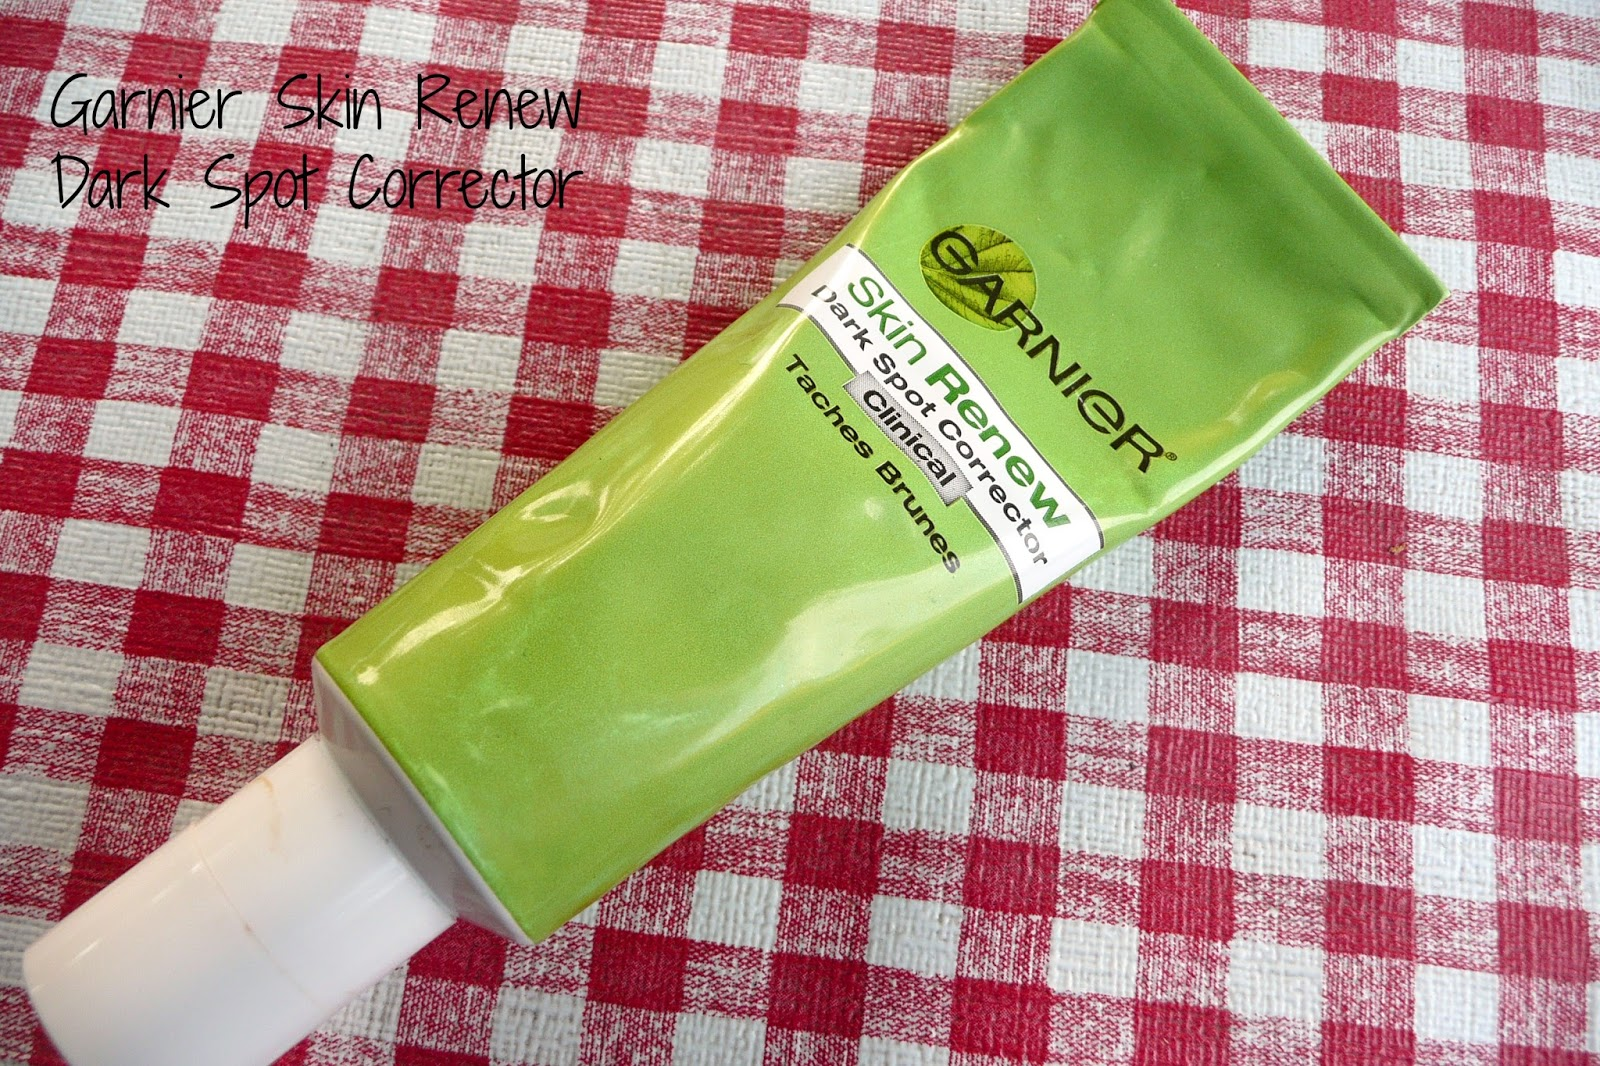 Garnier Skin Renew Dark Spot Corrector Review